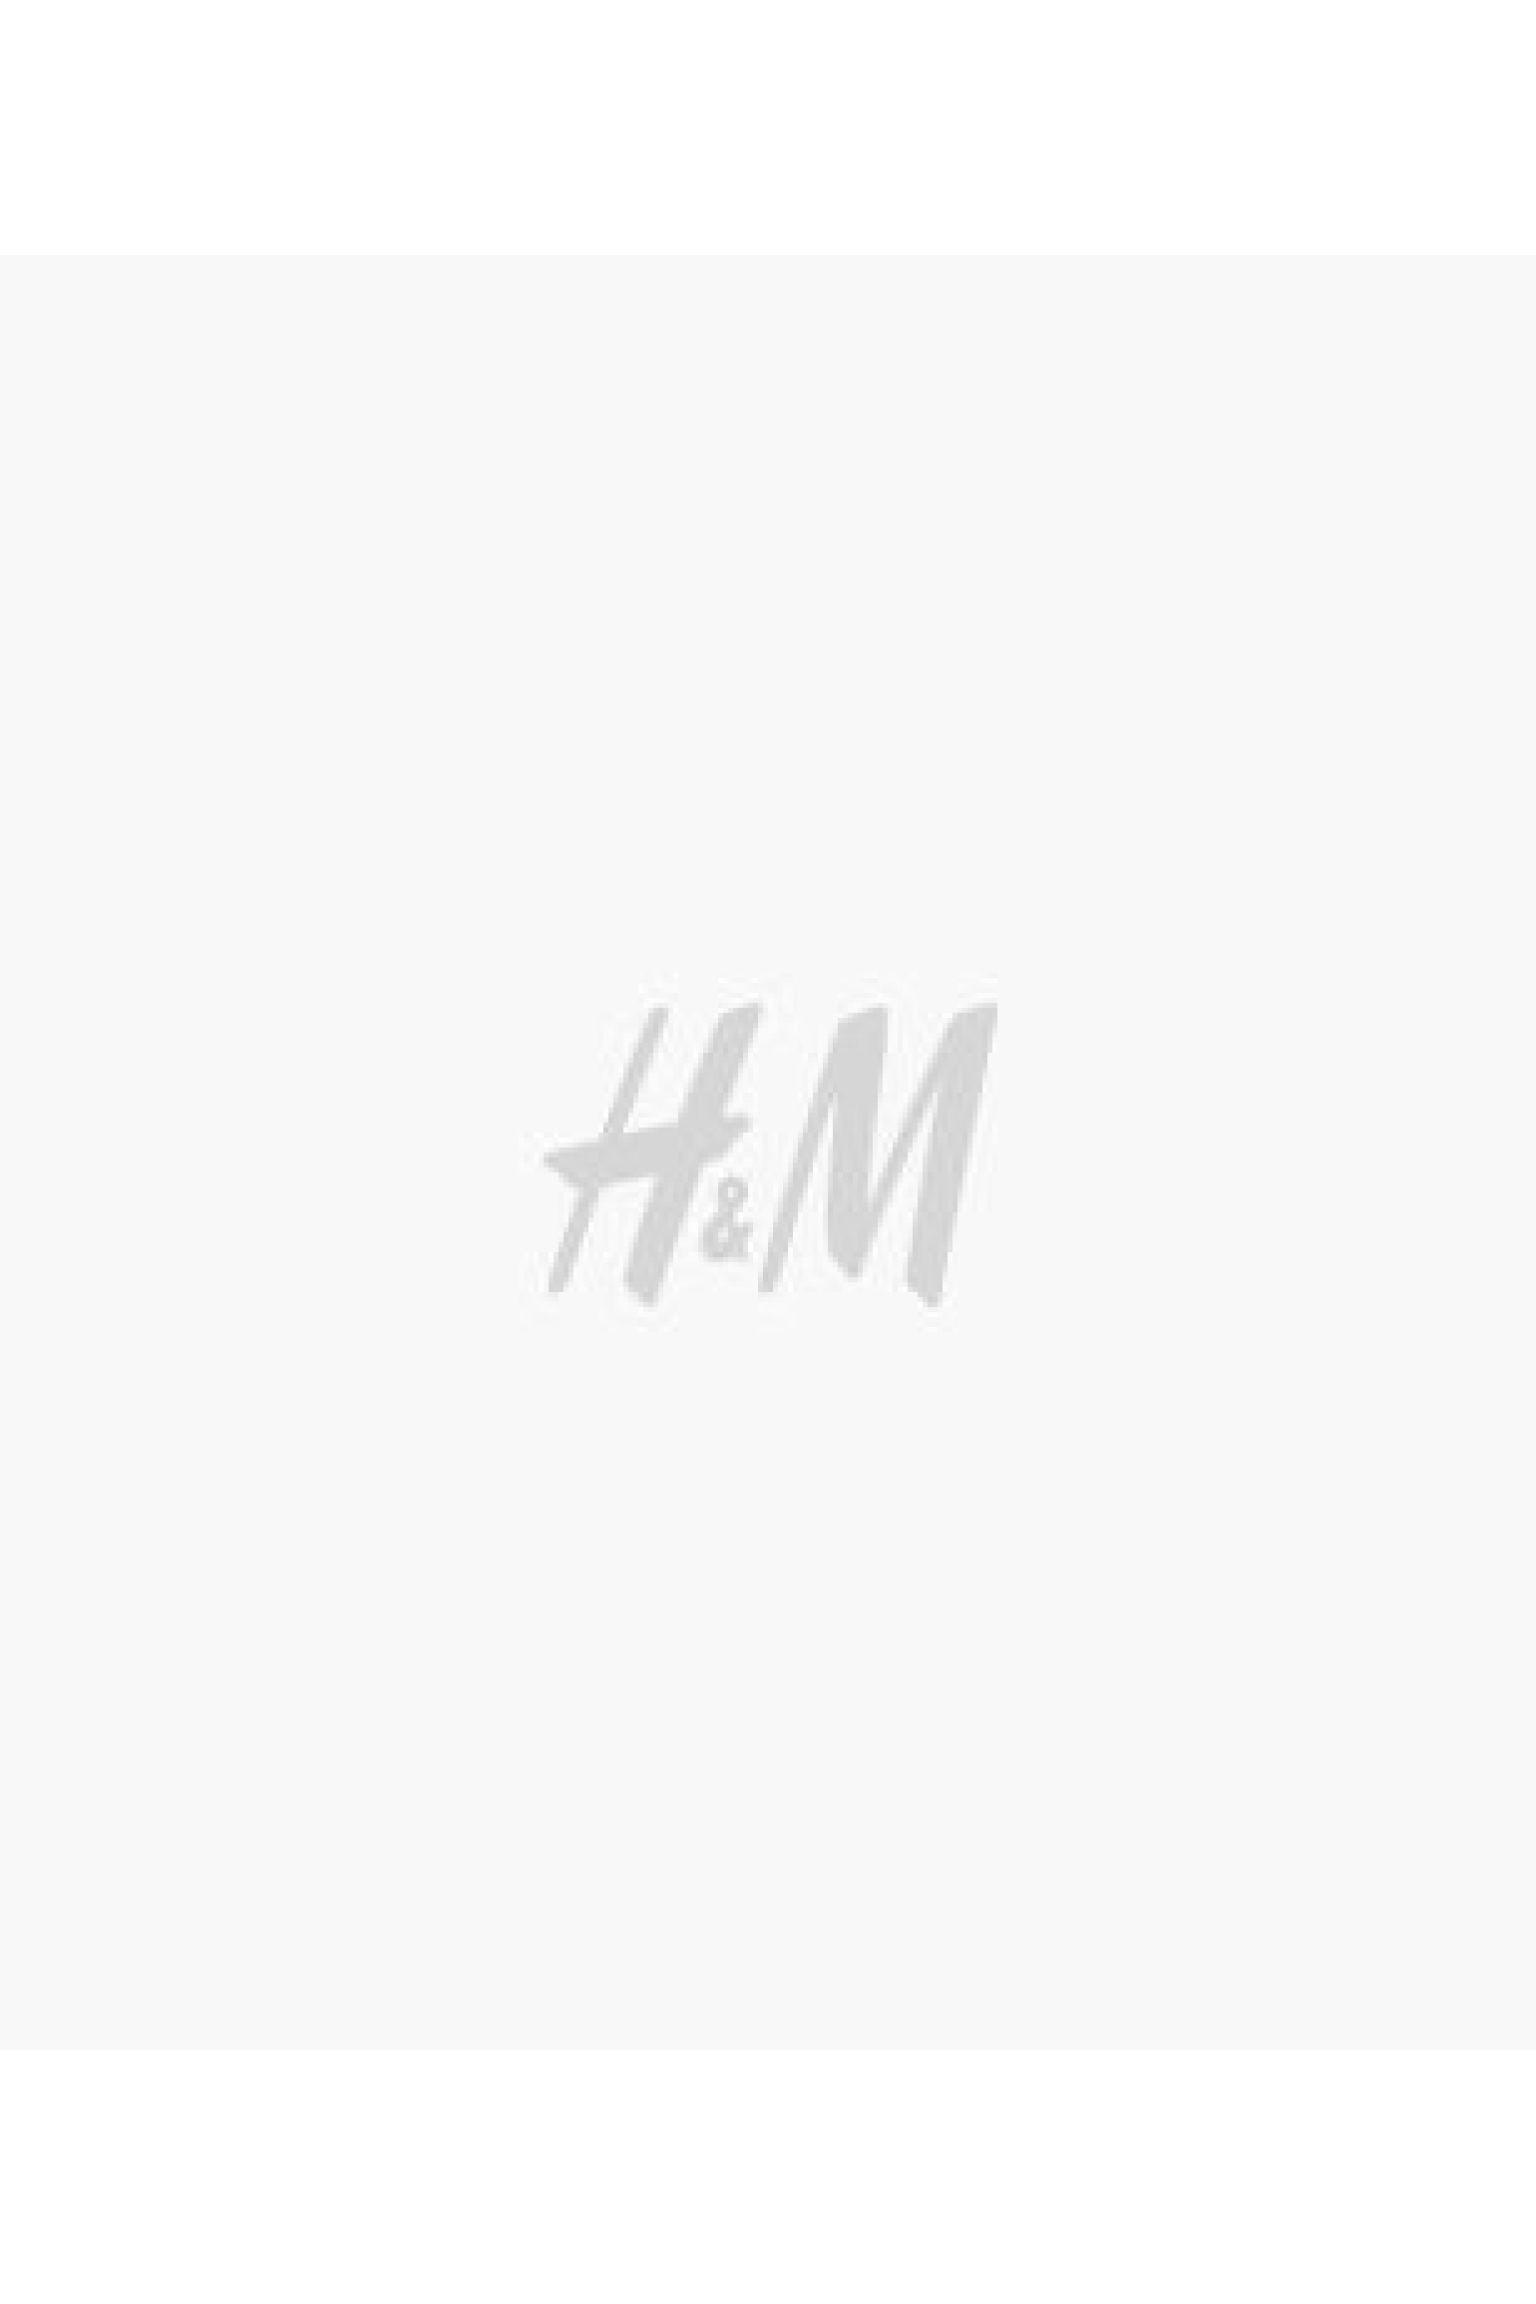 hmgoepprod (1536×2304)